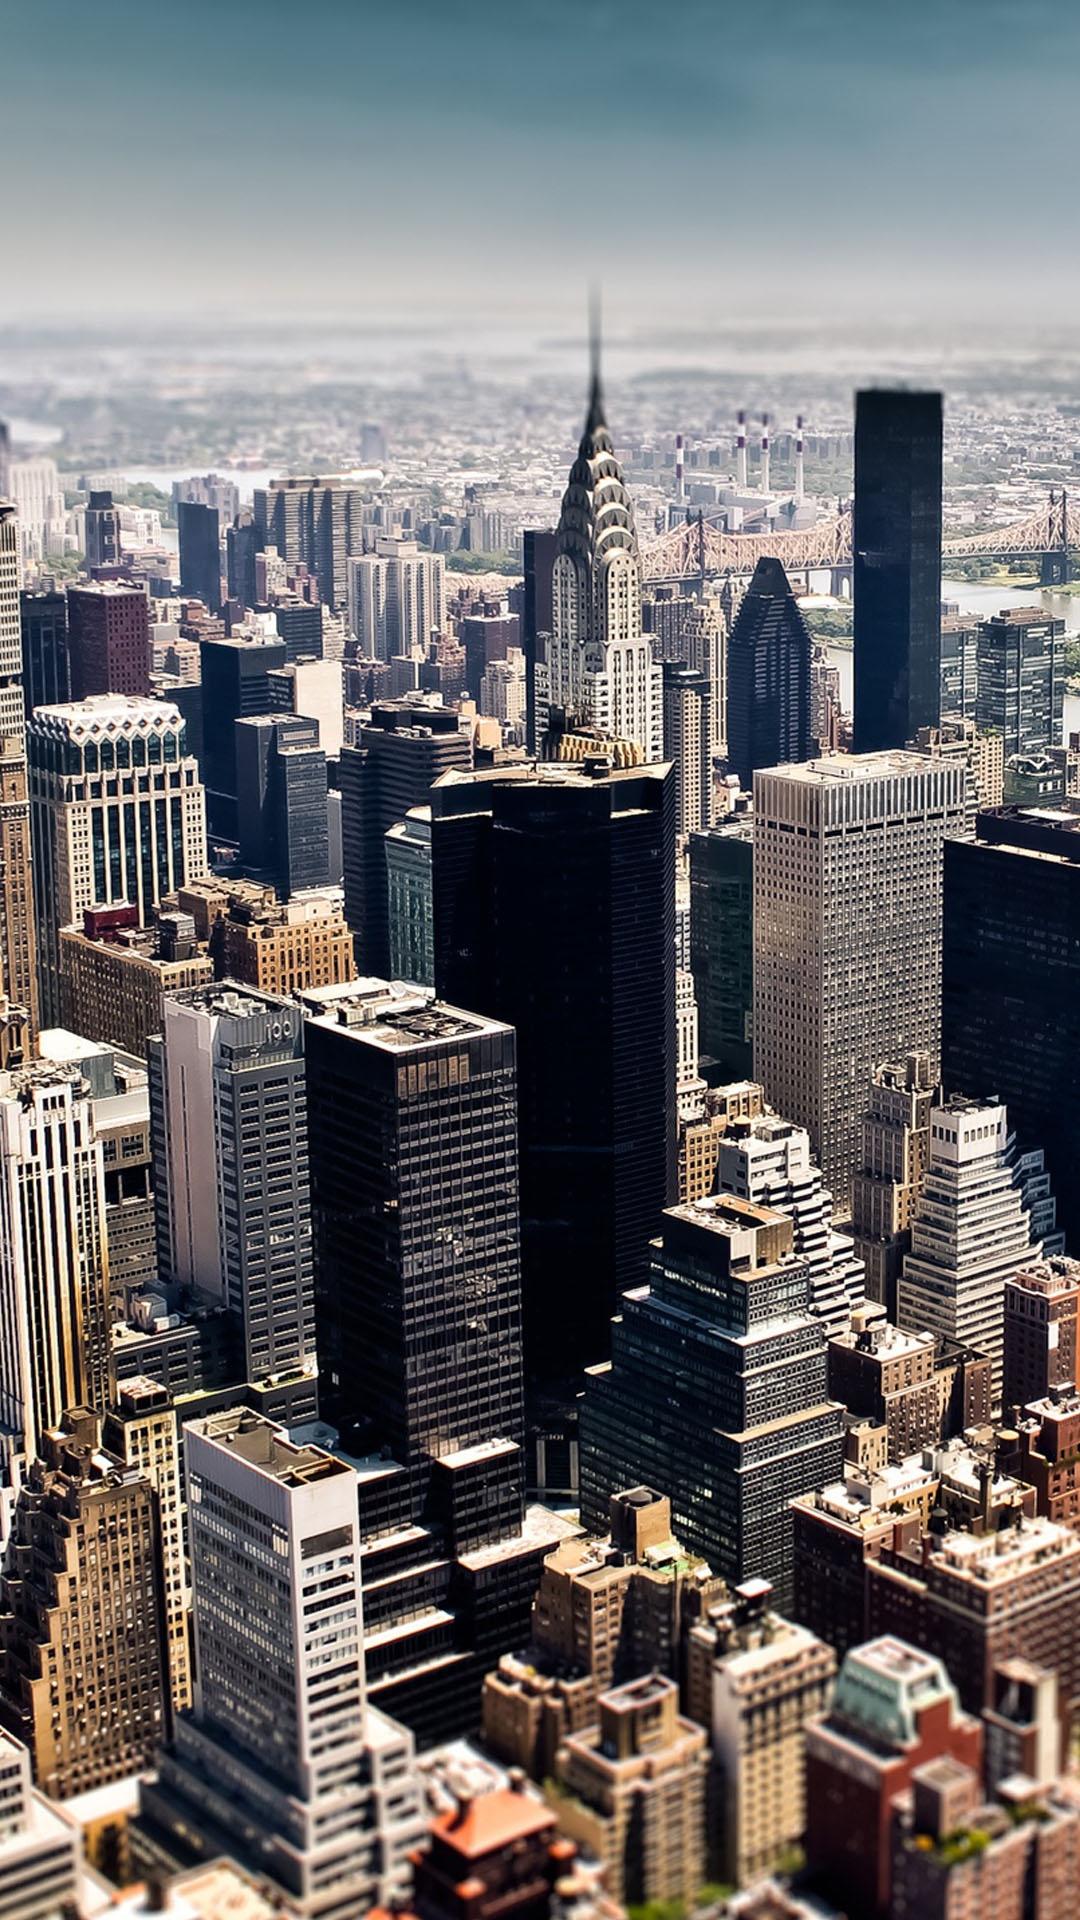 IPhone 6 Plus Wallpaper New York 13